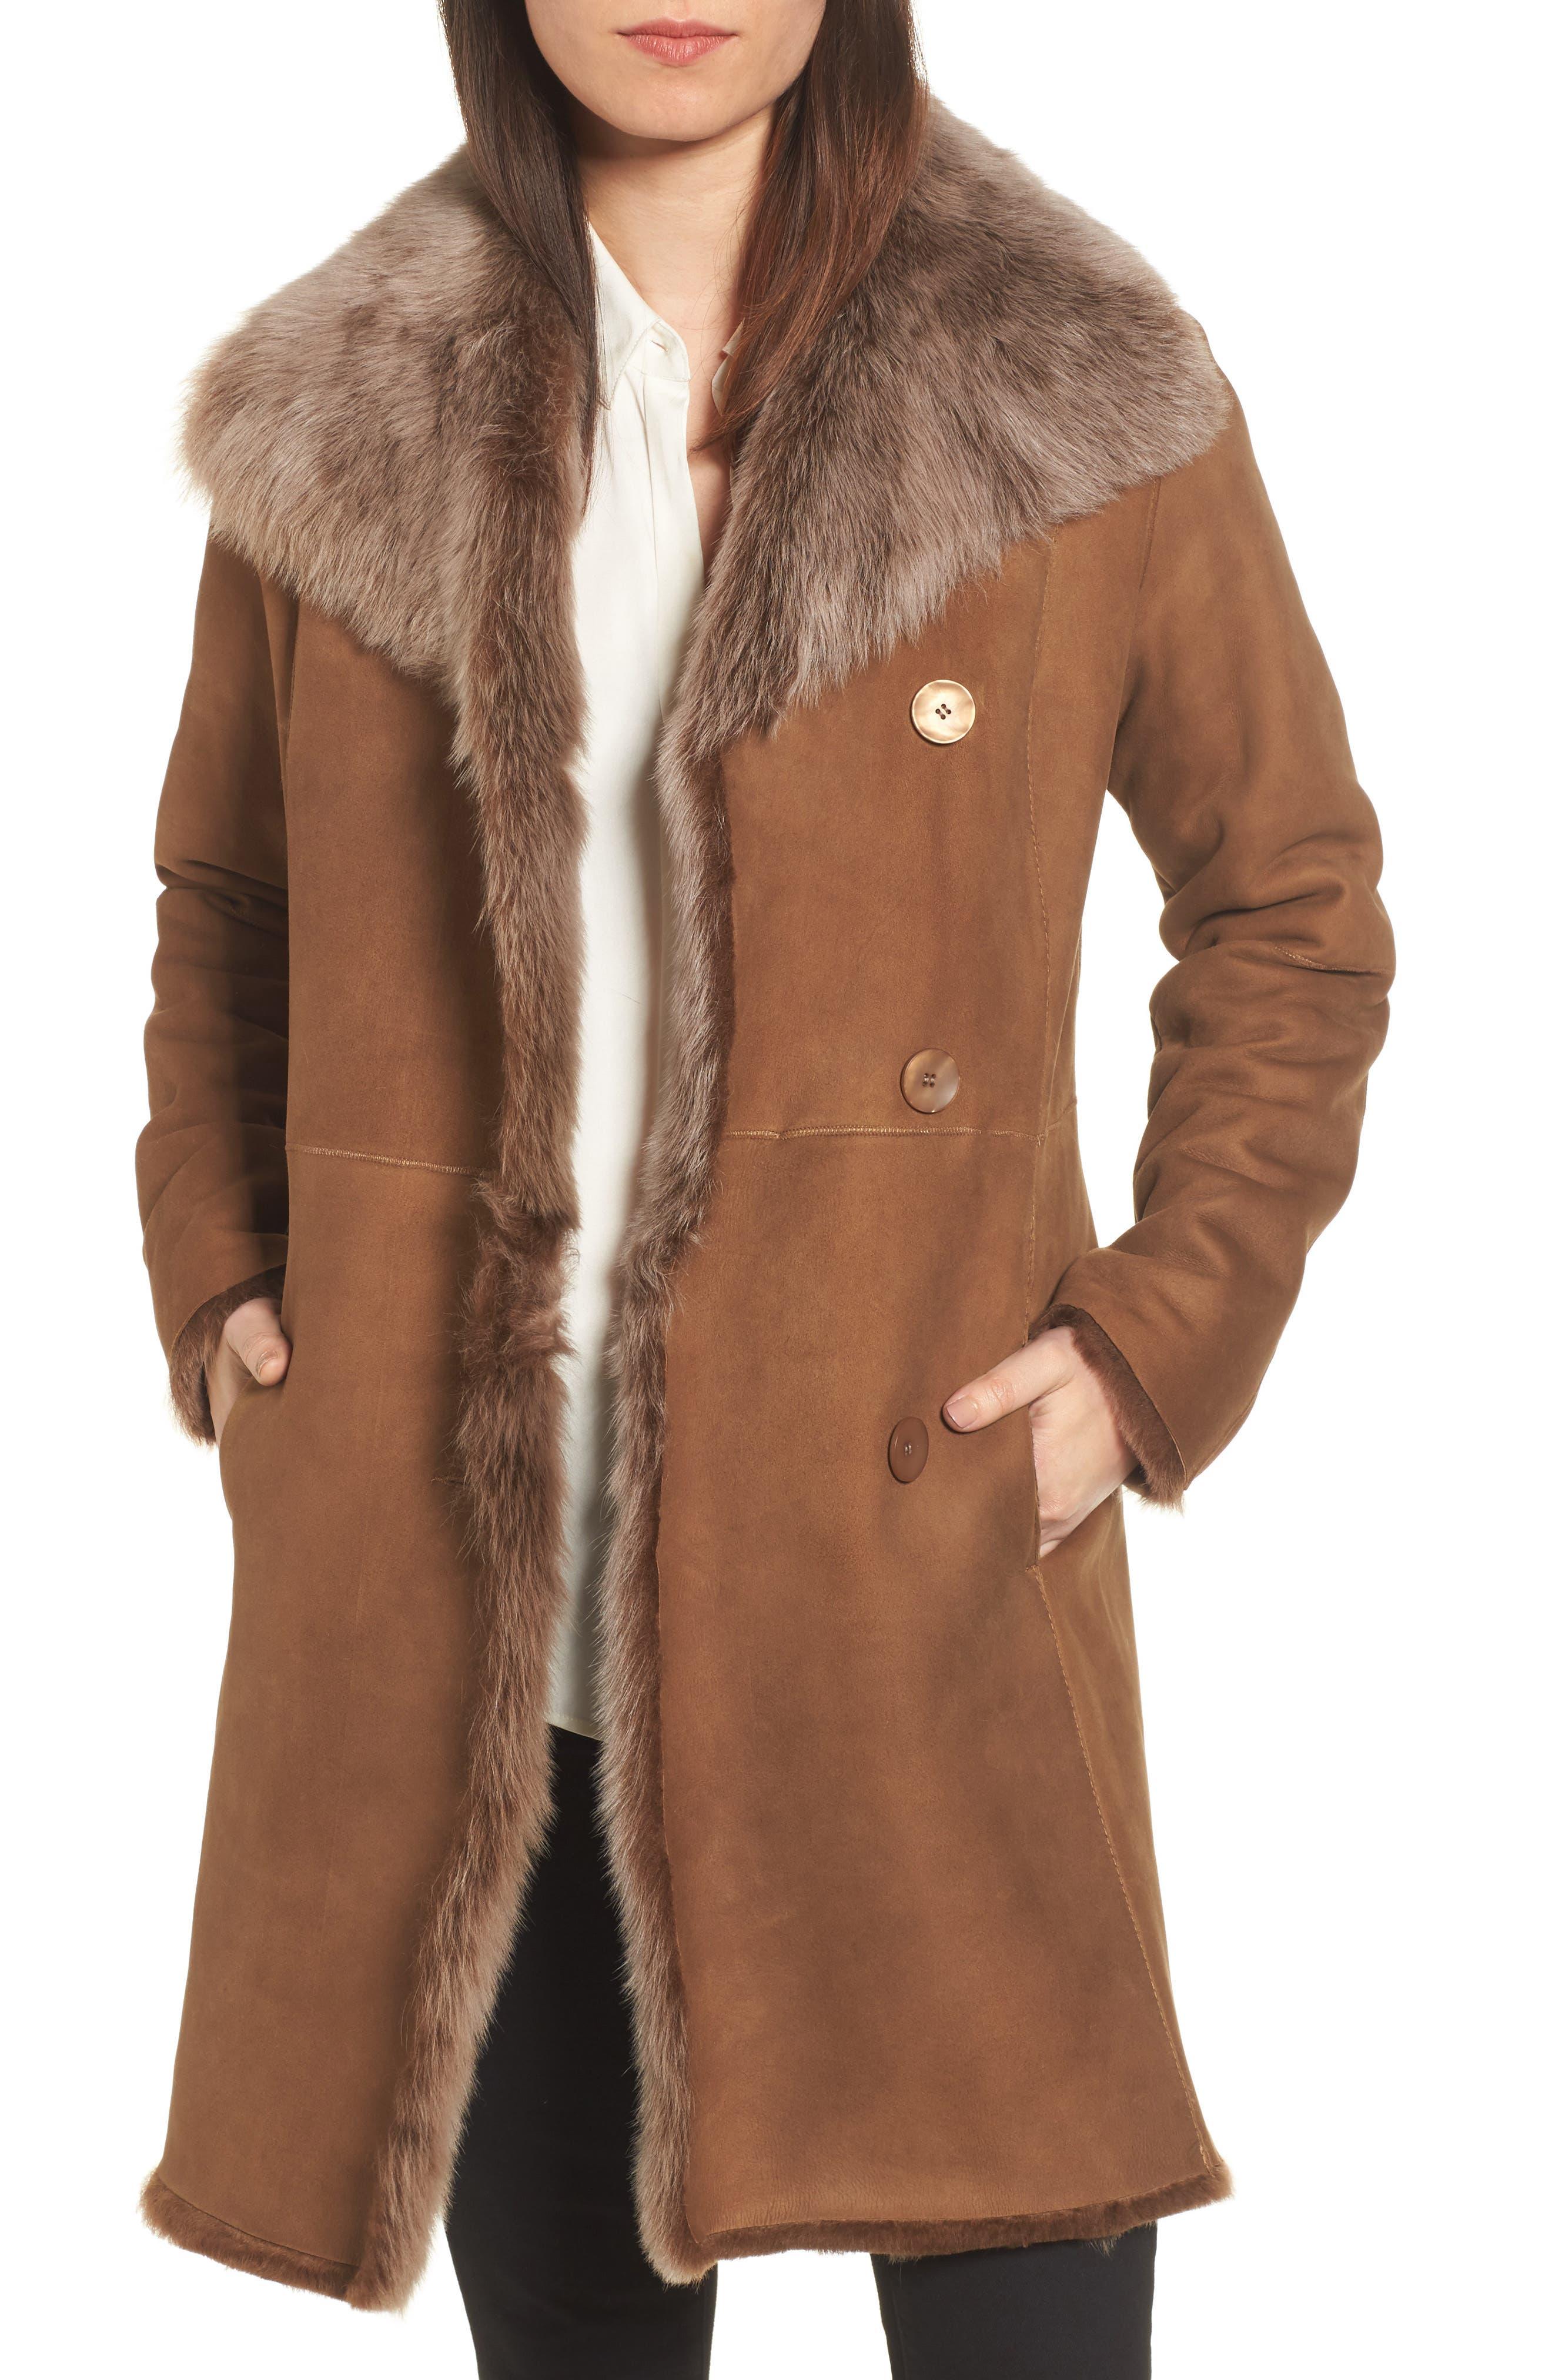 Genuine Toscana Shearling Coat,                             Main thumbnail 1, color,                             202